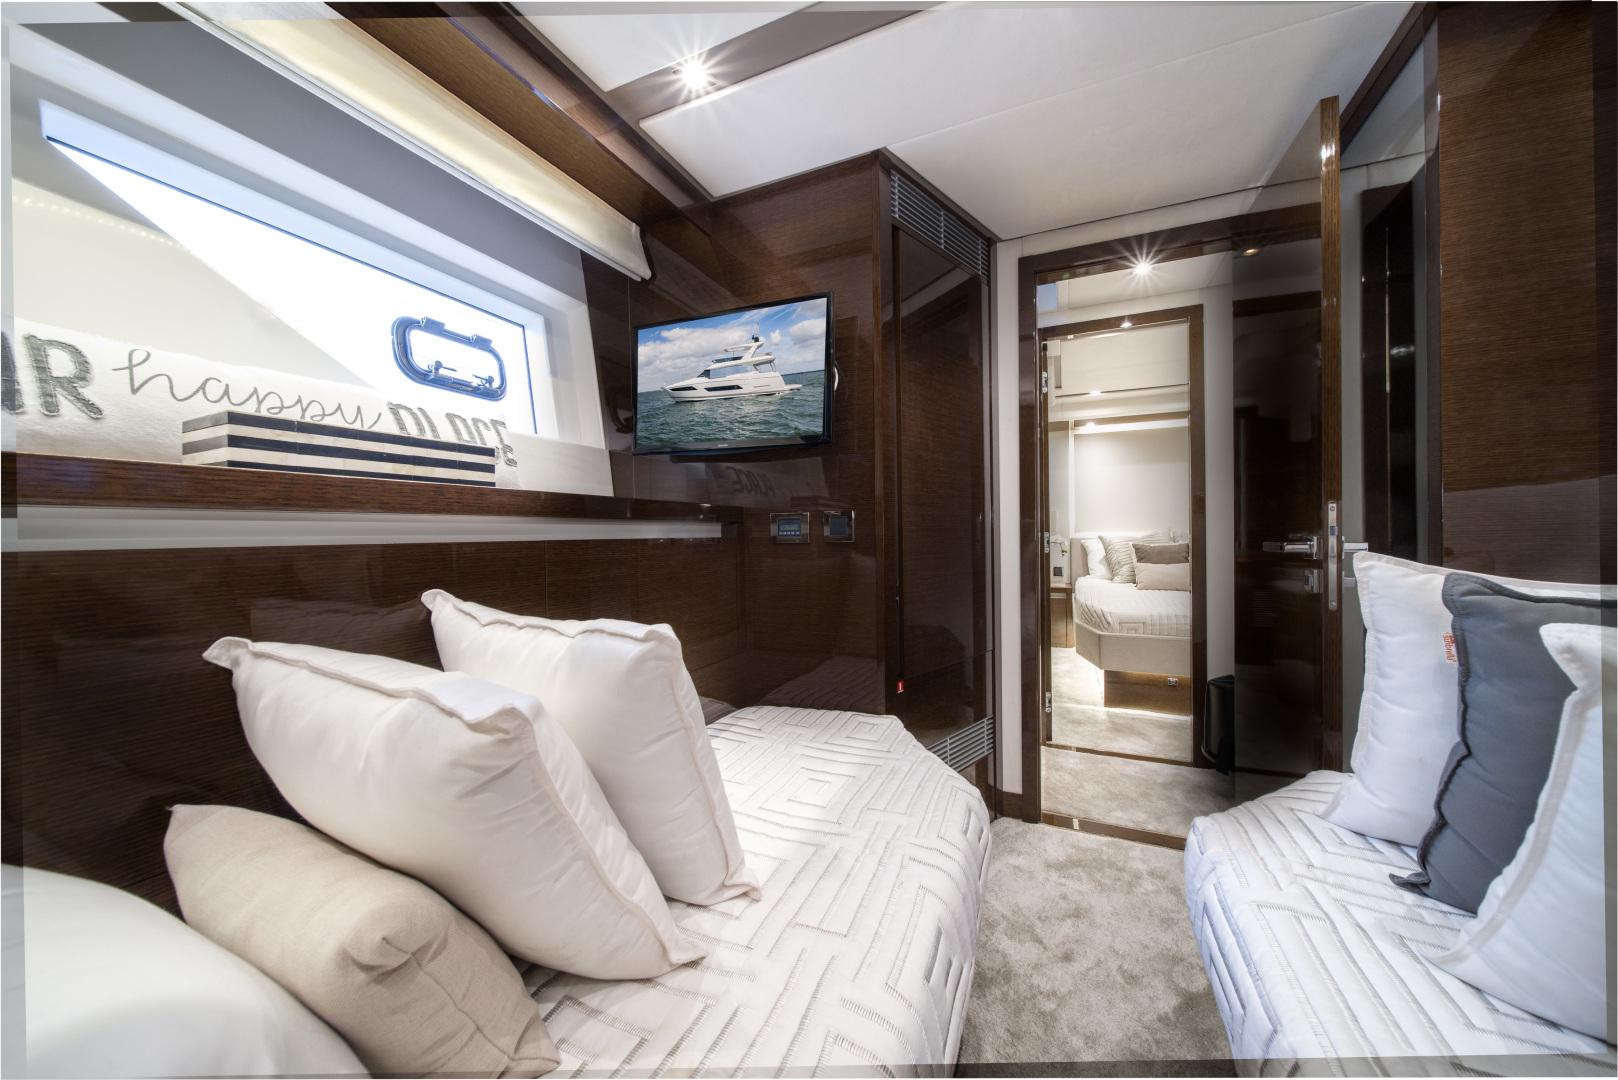 Prestige-680 Flybridge 2018-Seduction Sarasota-Florida-United States-2018 68 Prestige 680 Flybridge  Starboard Stateroom-1503613 | Thumbnail